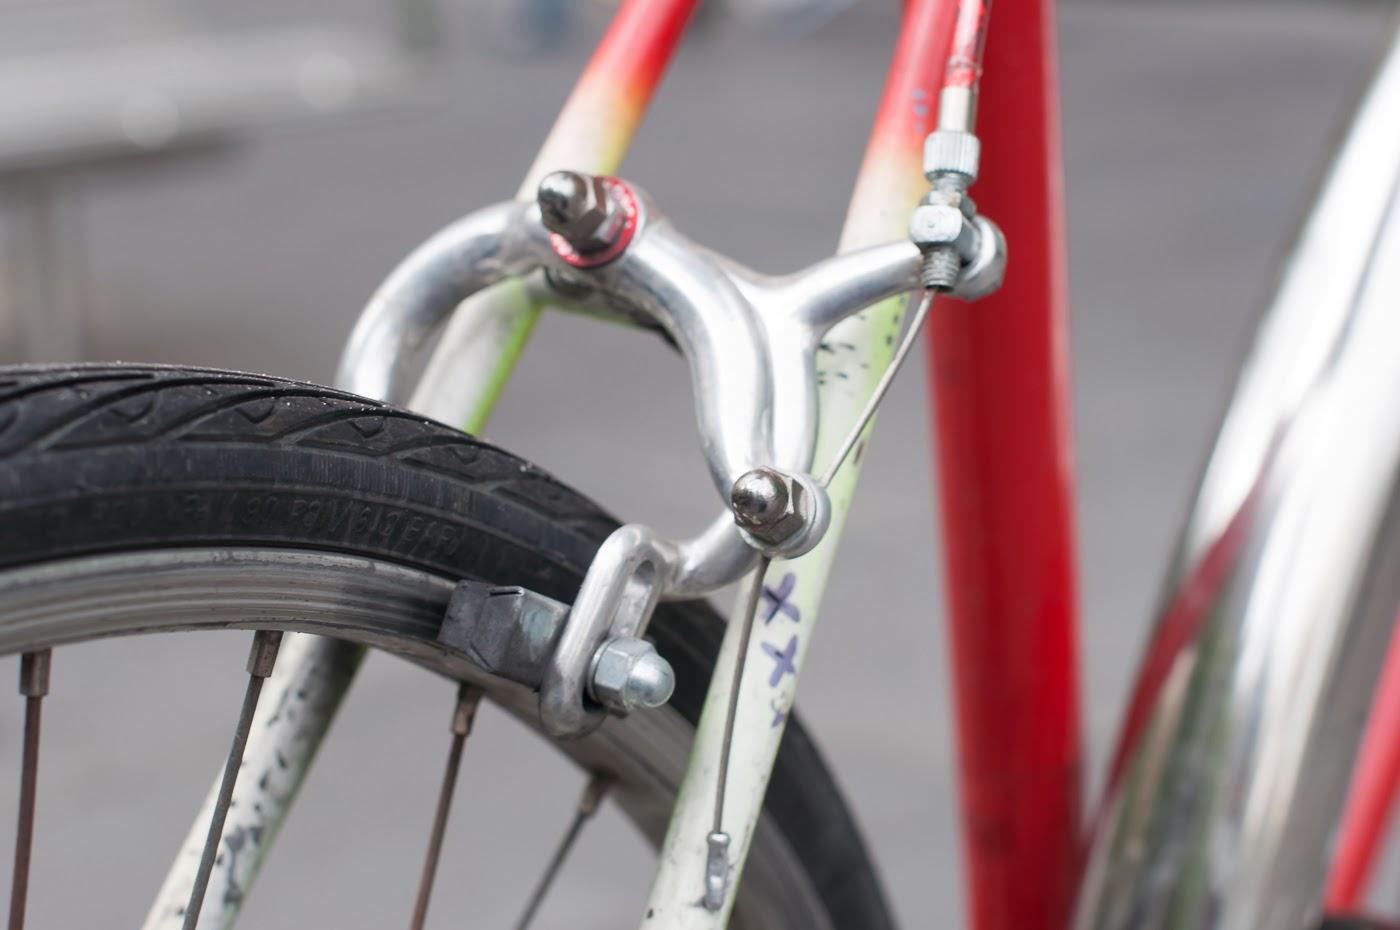 Pub bike, bike, bicycle, conversion, road bike, tim macauley, the biketorialist, Melbourne, Australia, swanston st, rear brake, side pull